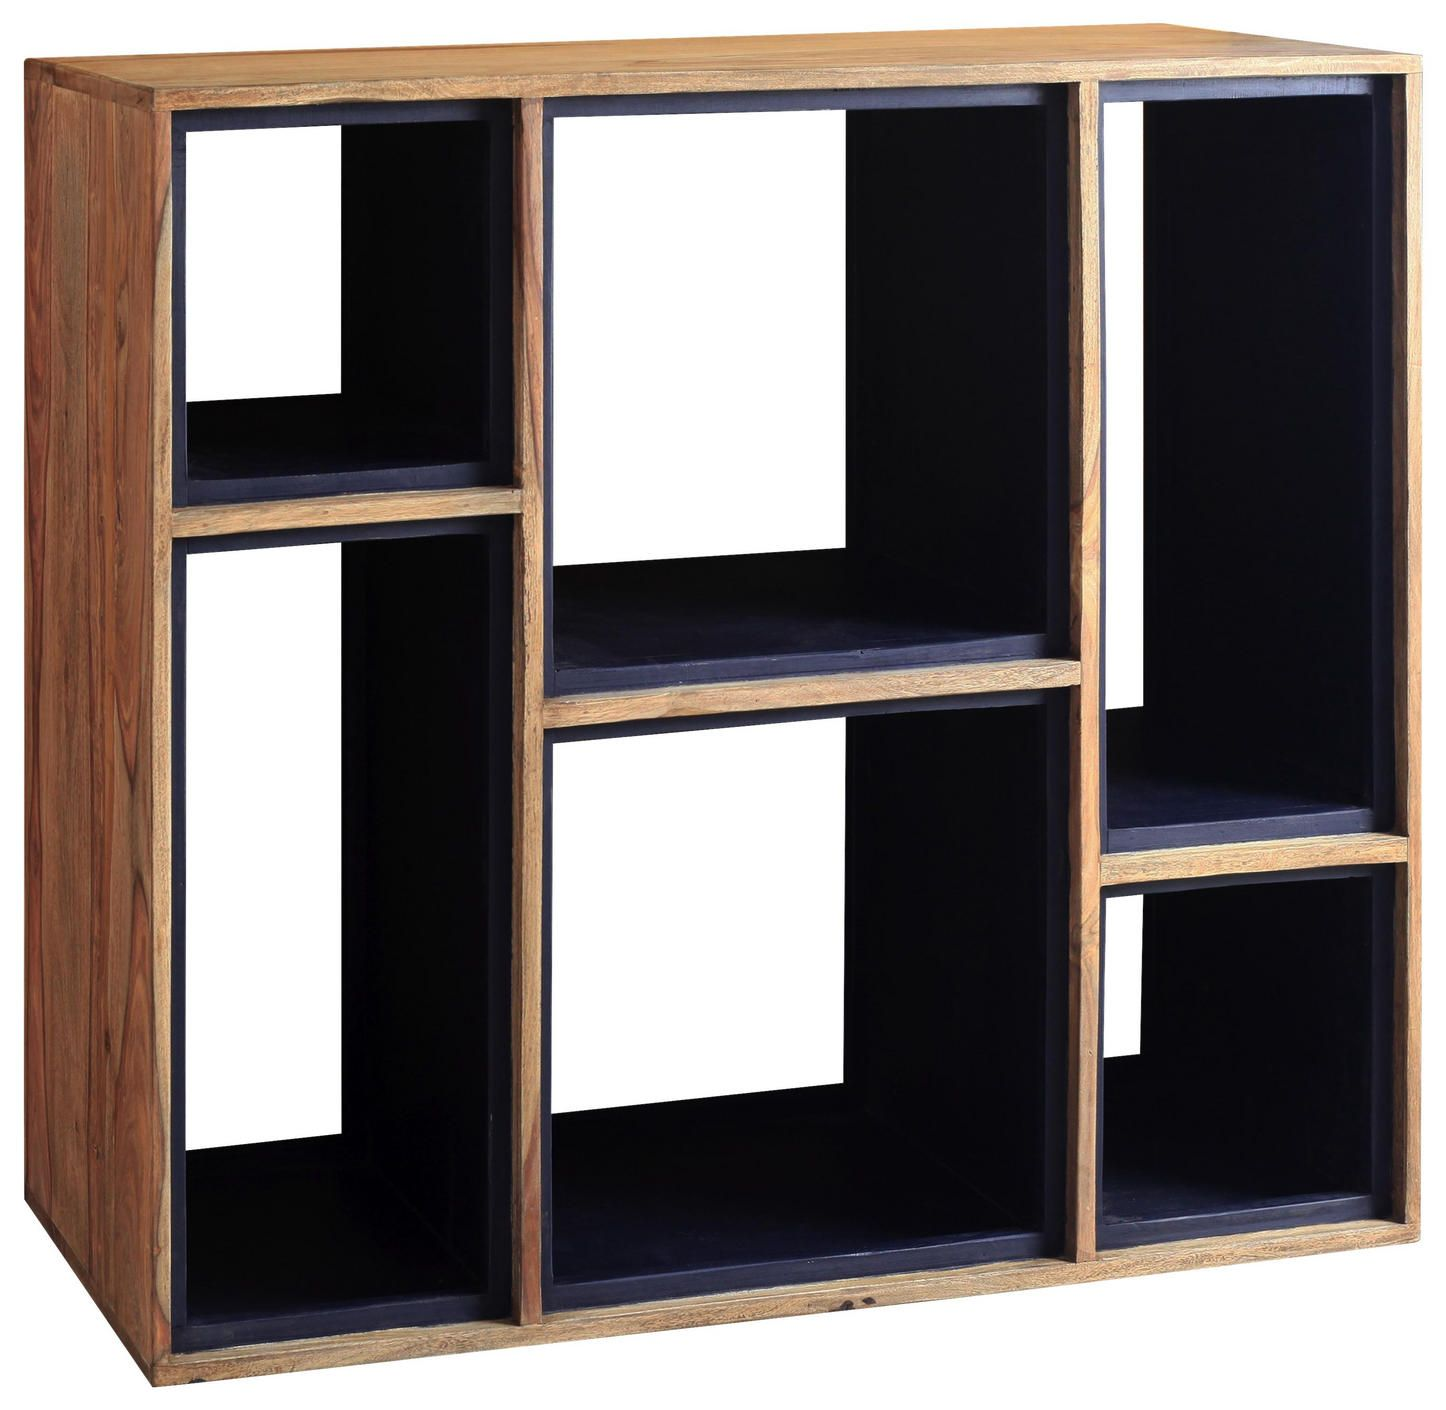 Regal Aus Sheesham Massiv Mit 6 Fachern Kaufen Regal Regal Massivholz Regal Cube